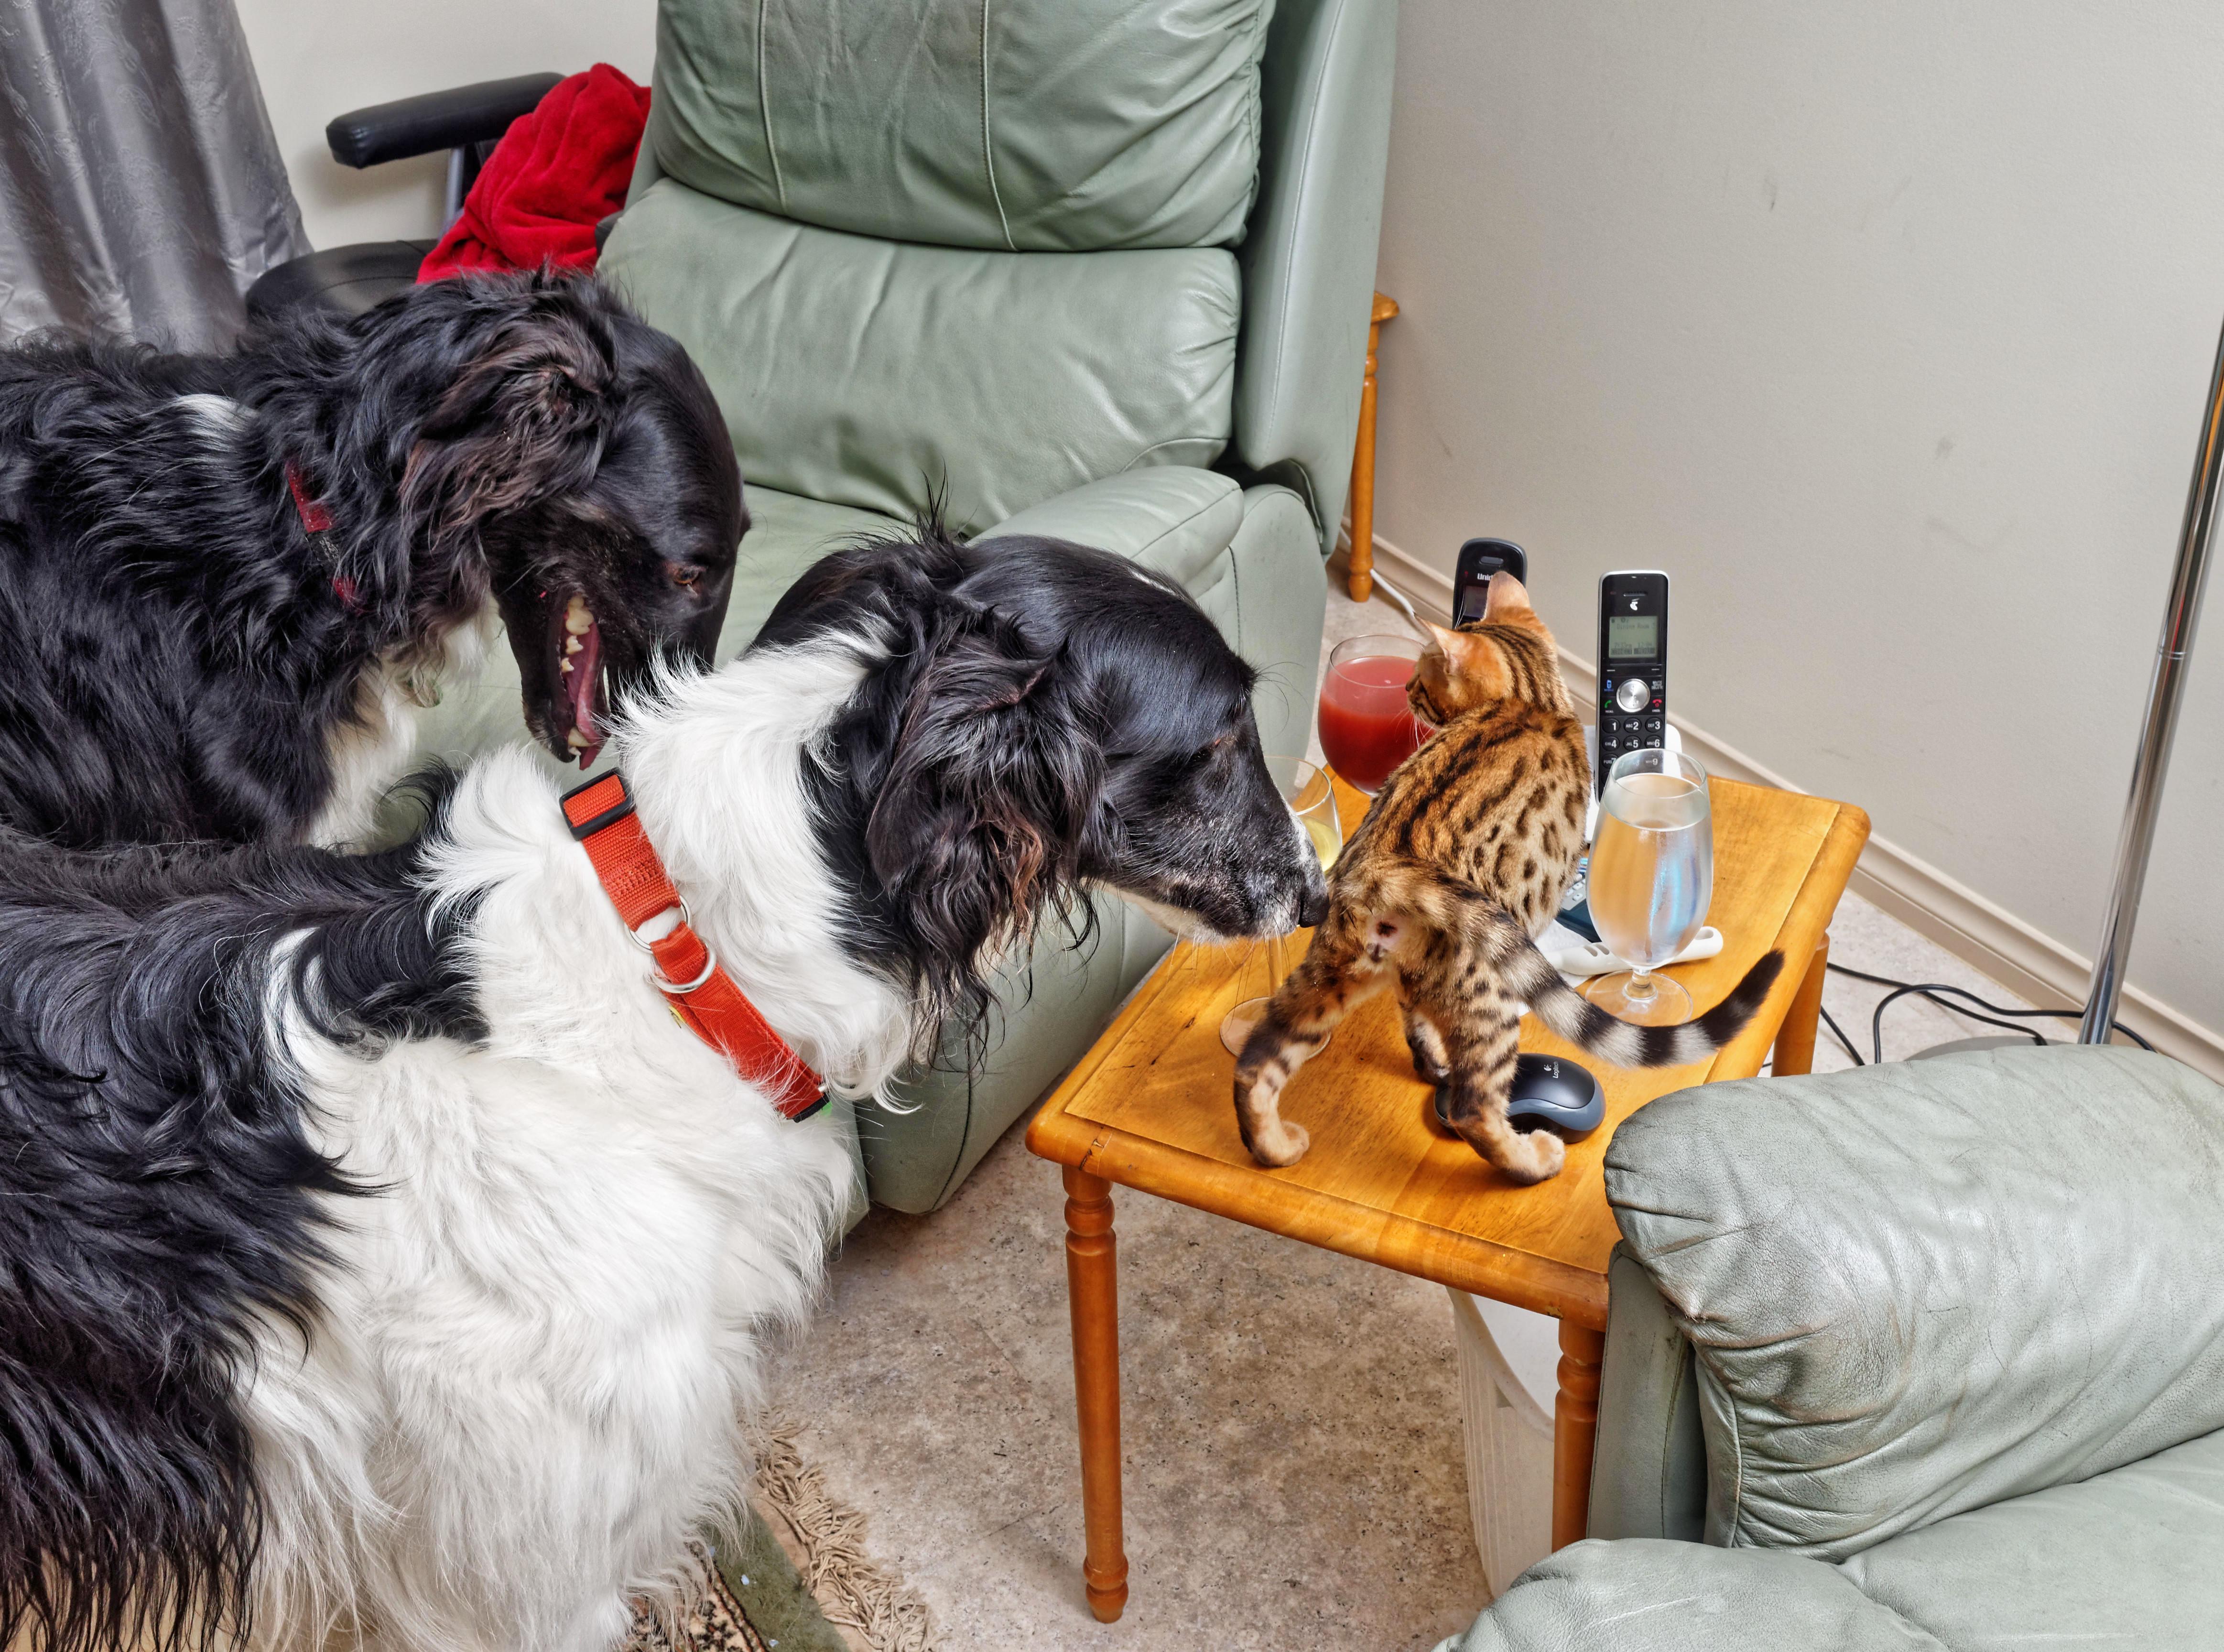 Dogs-and-Rani-19.jpeg